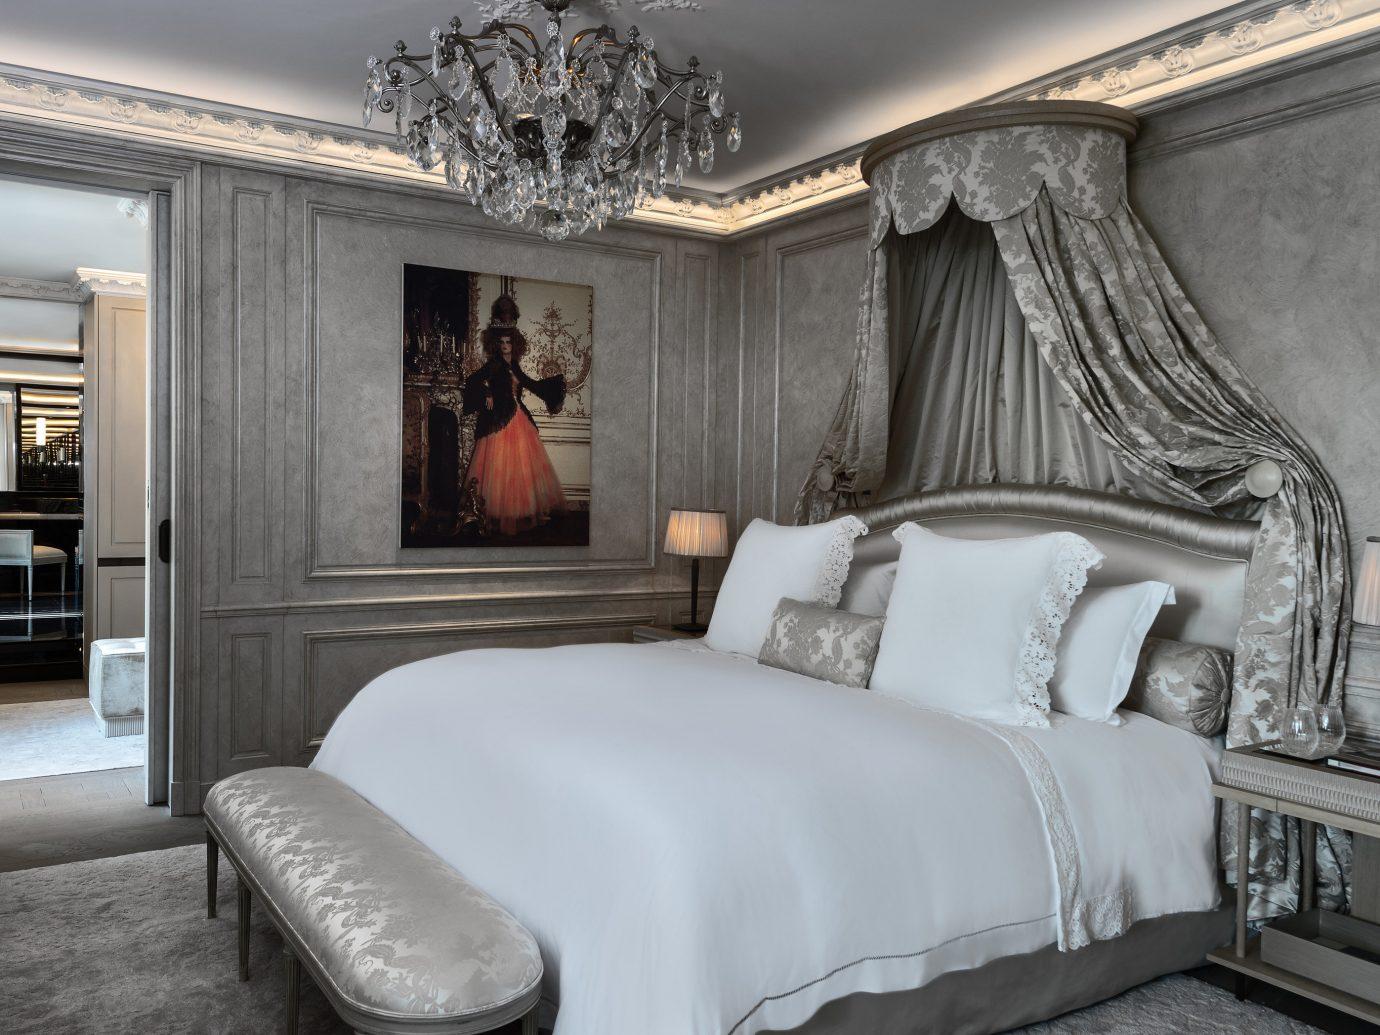 Hotels Luxury Travel indoor bed wall sofa floor room interior design ceiling Bedroom home Suite bed frame furniture window bed sheet interior designer mattress